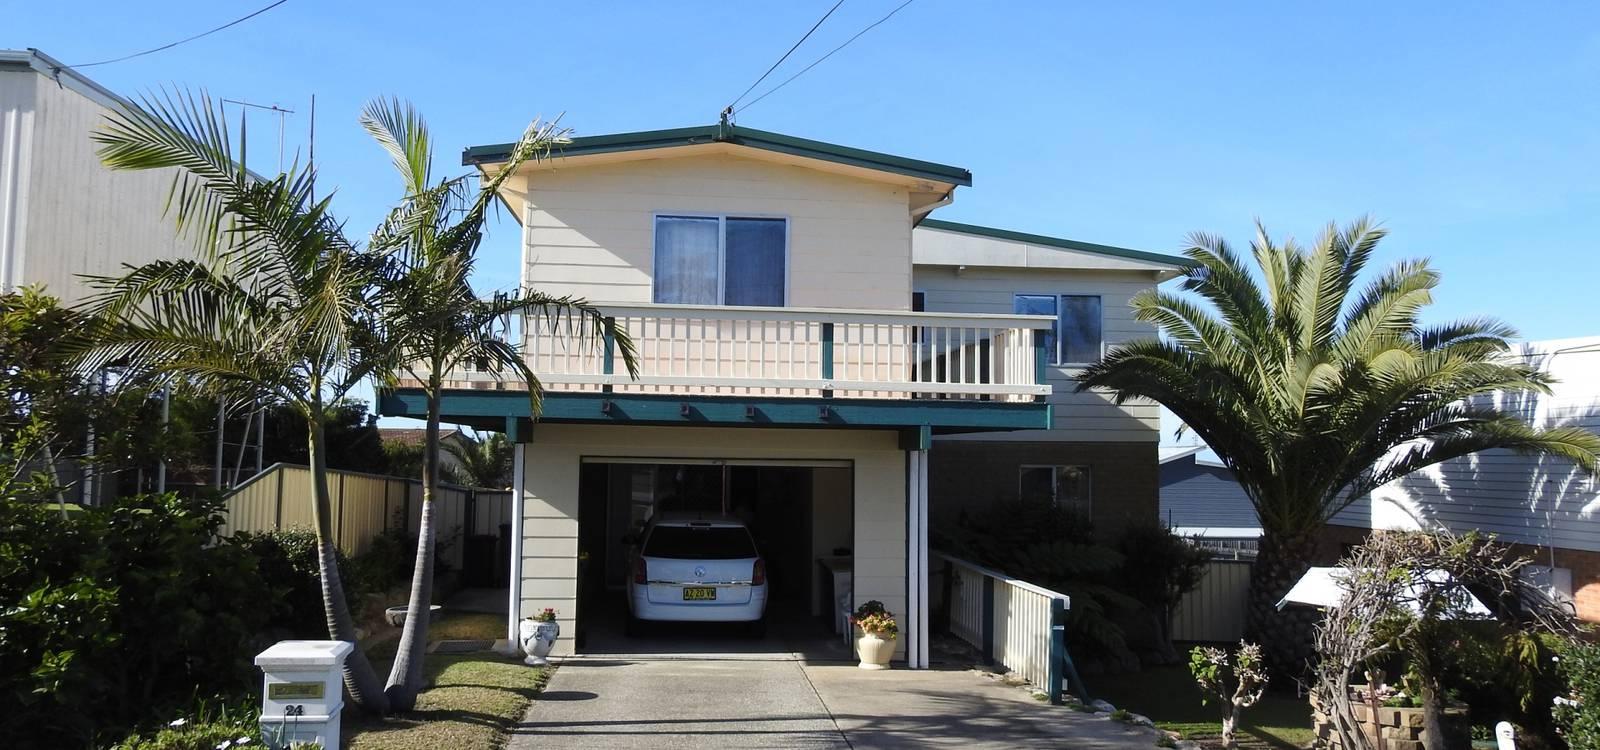 24 Bream Street TUROSS HEAD, NSW 2537 - photo 1